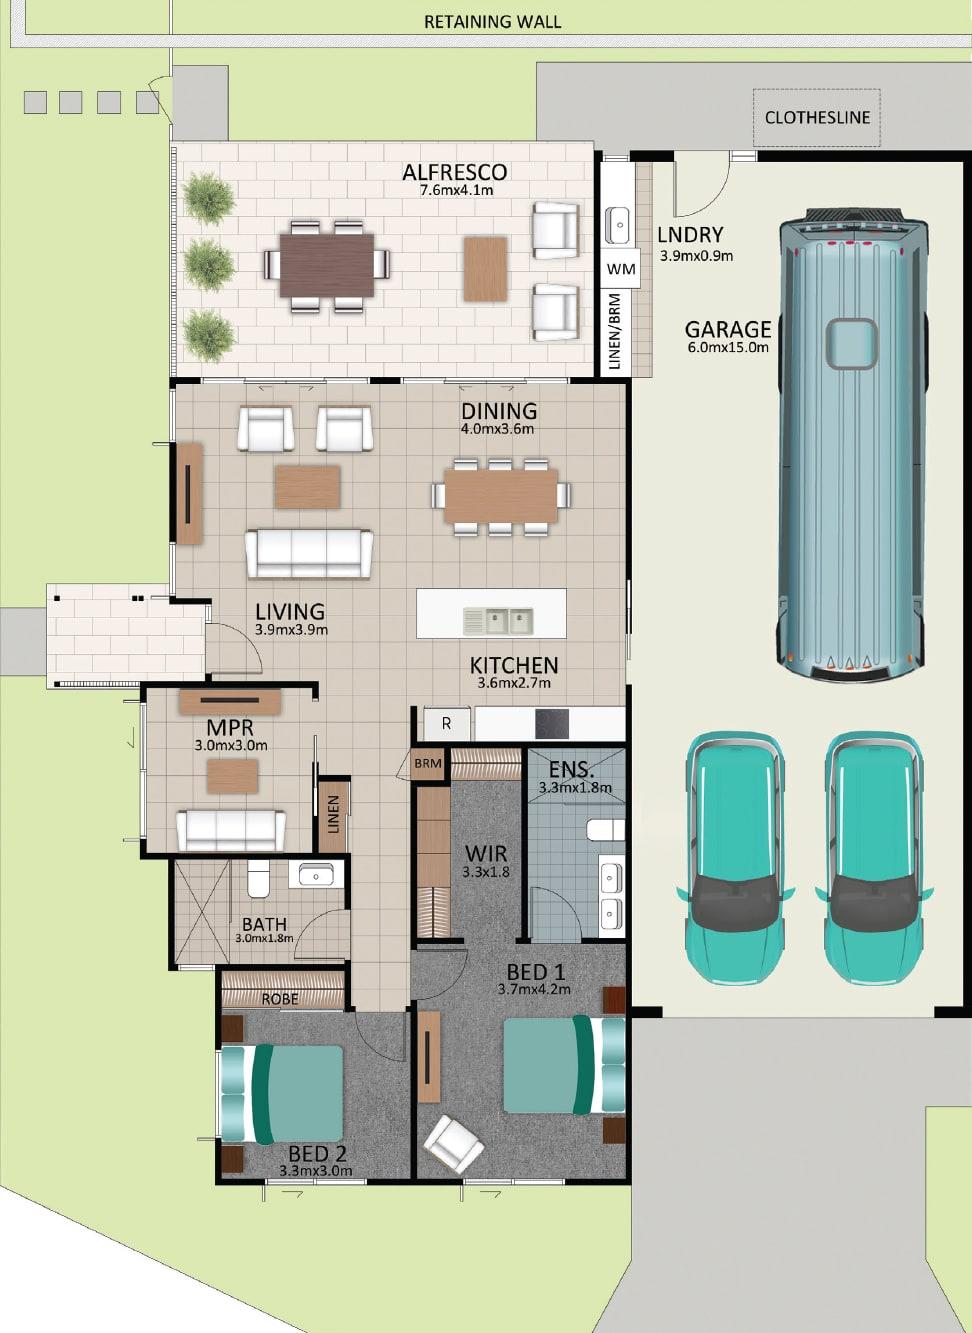 LAT25 Floorplan GAL LOT 222 FEB2021 V1 - Lot 222